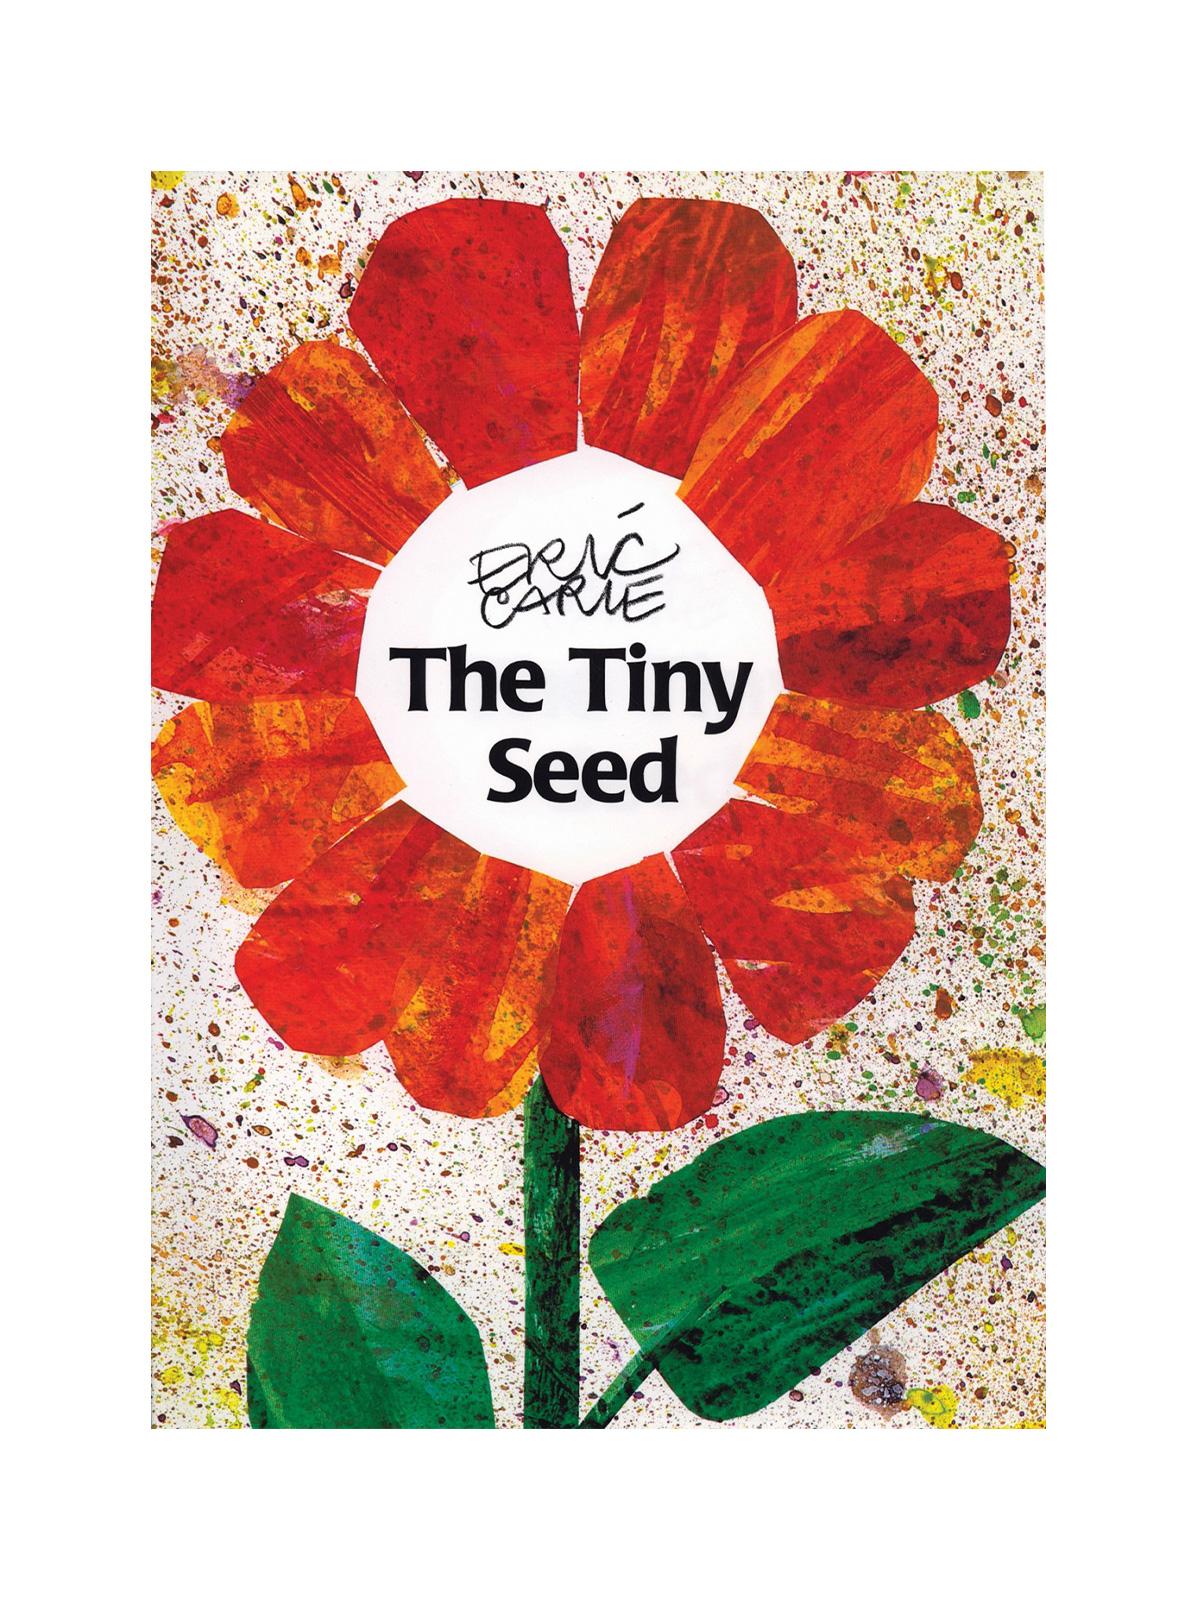 chm-eric-carle-the-tiny-seed